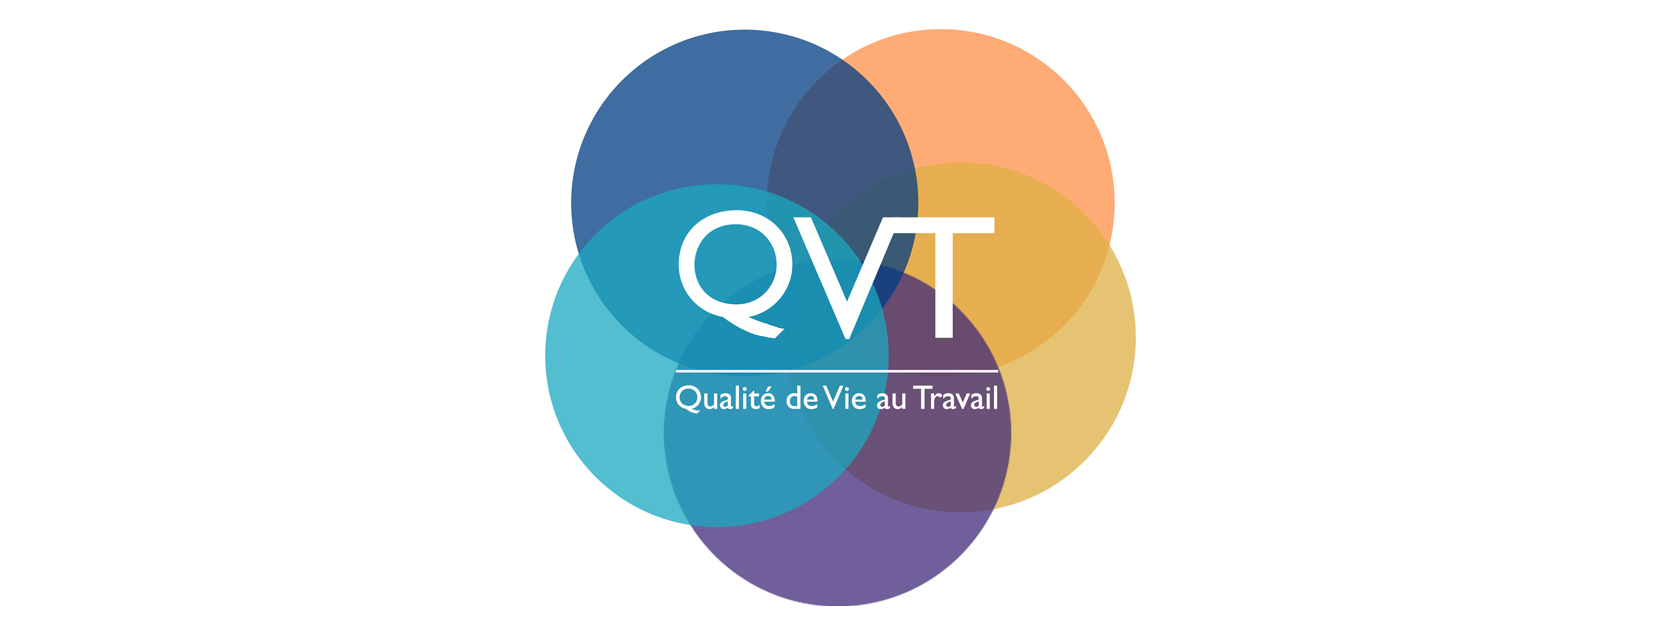 qvt logo 01